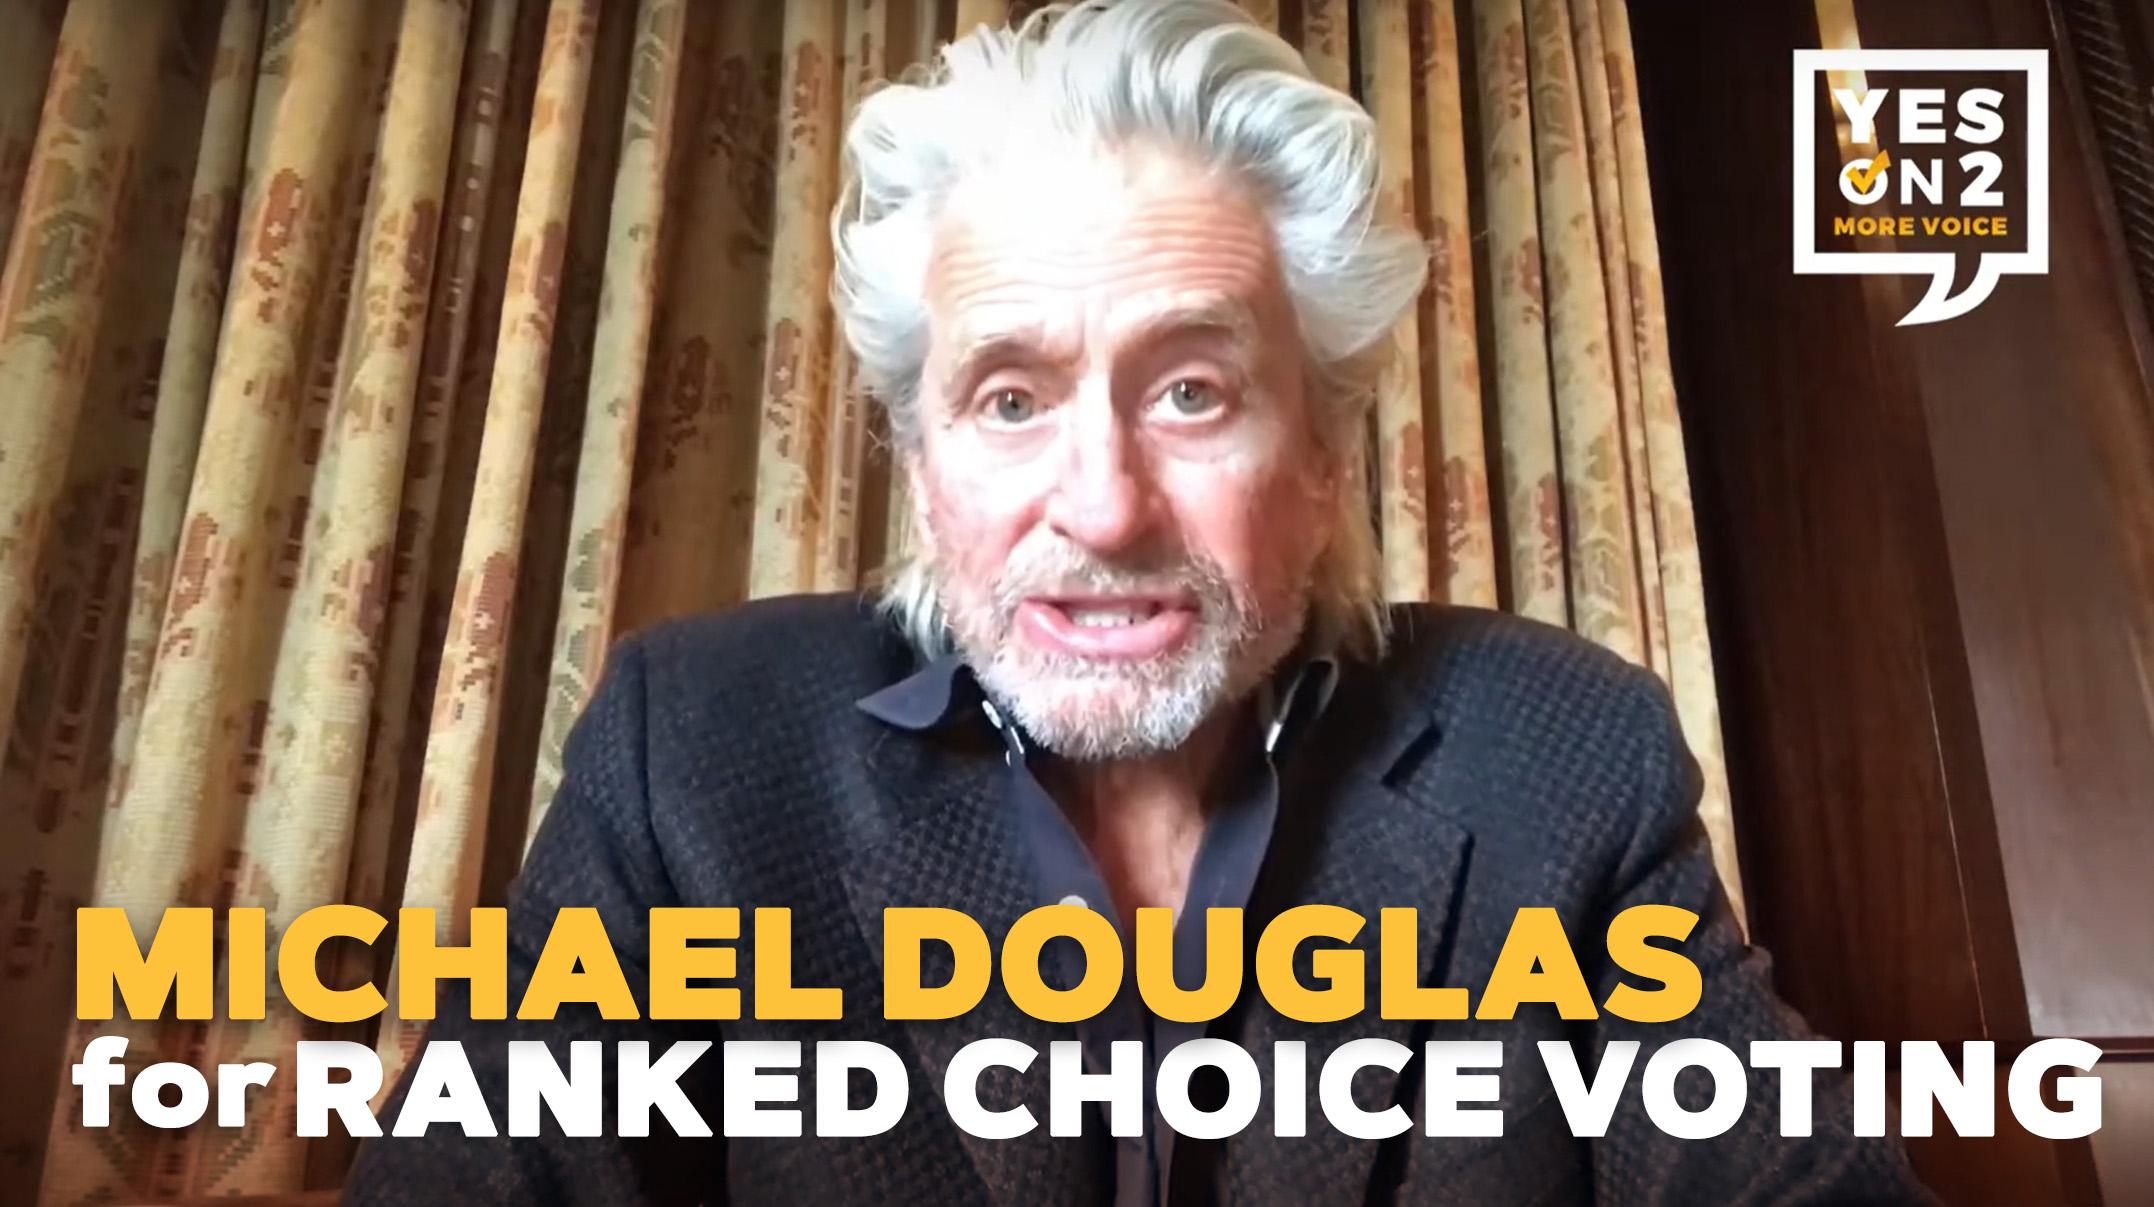 Michael Douglas: Vote YES on 2 Massachusetts